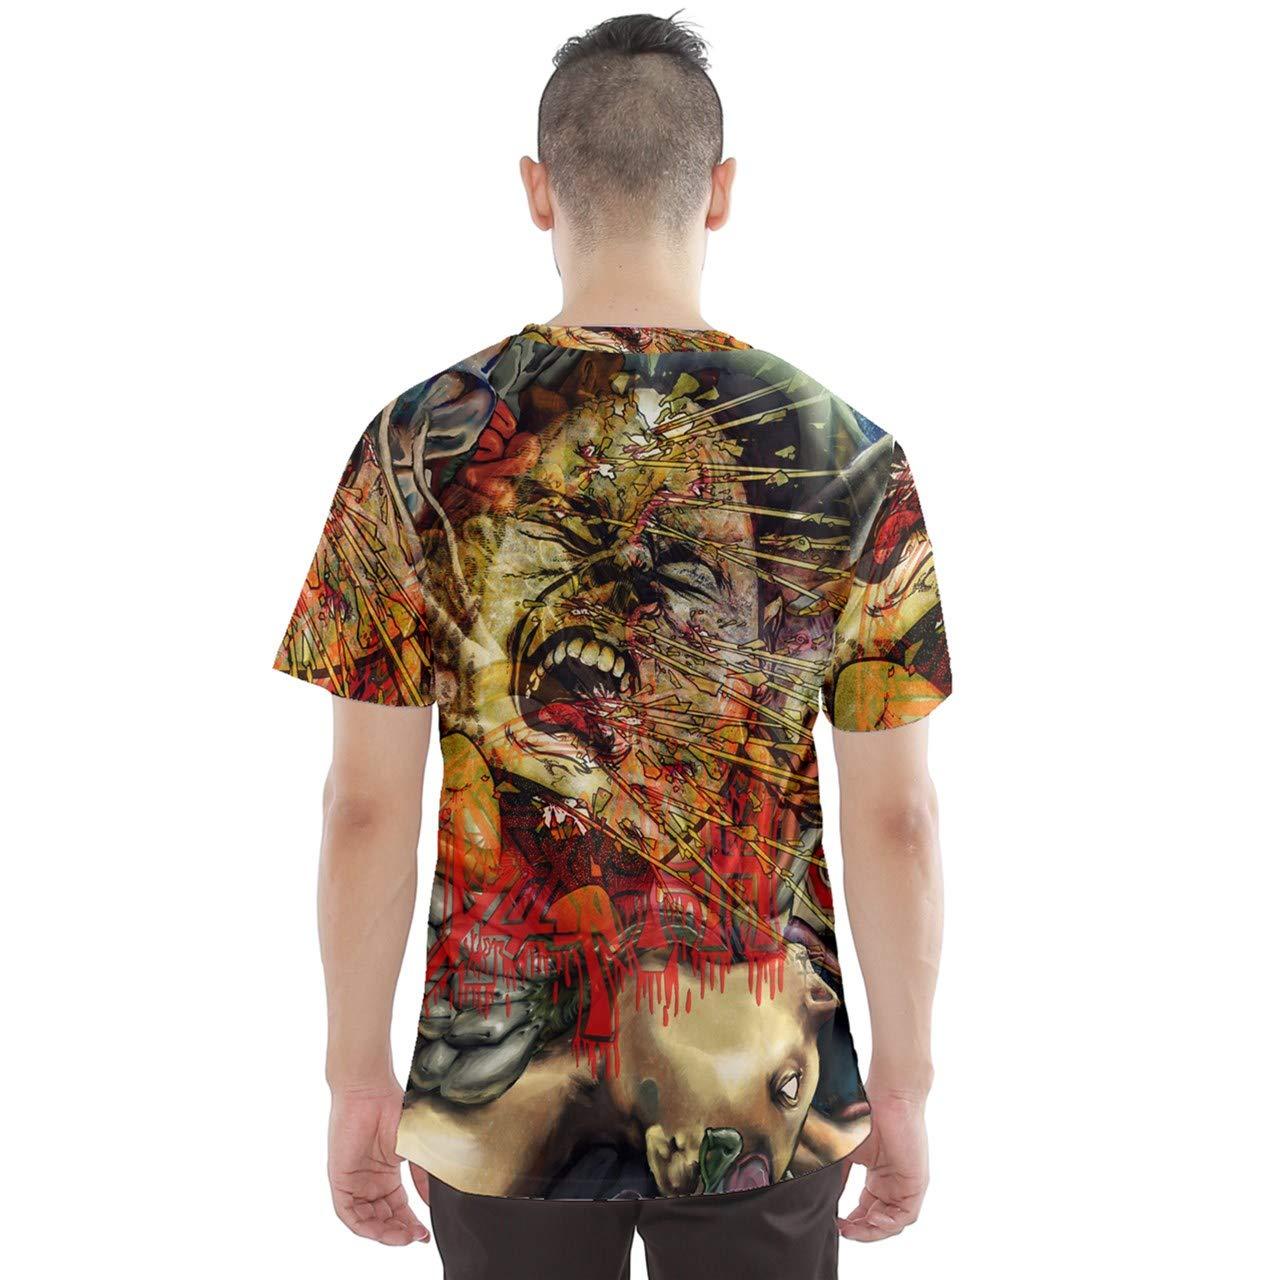 Dcustomwatch Death Metal Rock DMT Dark Psychedelic Design 3D Full Print T-Shirt